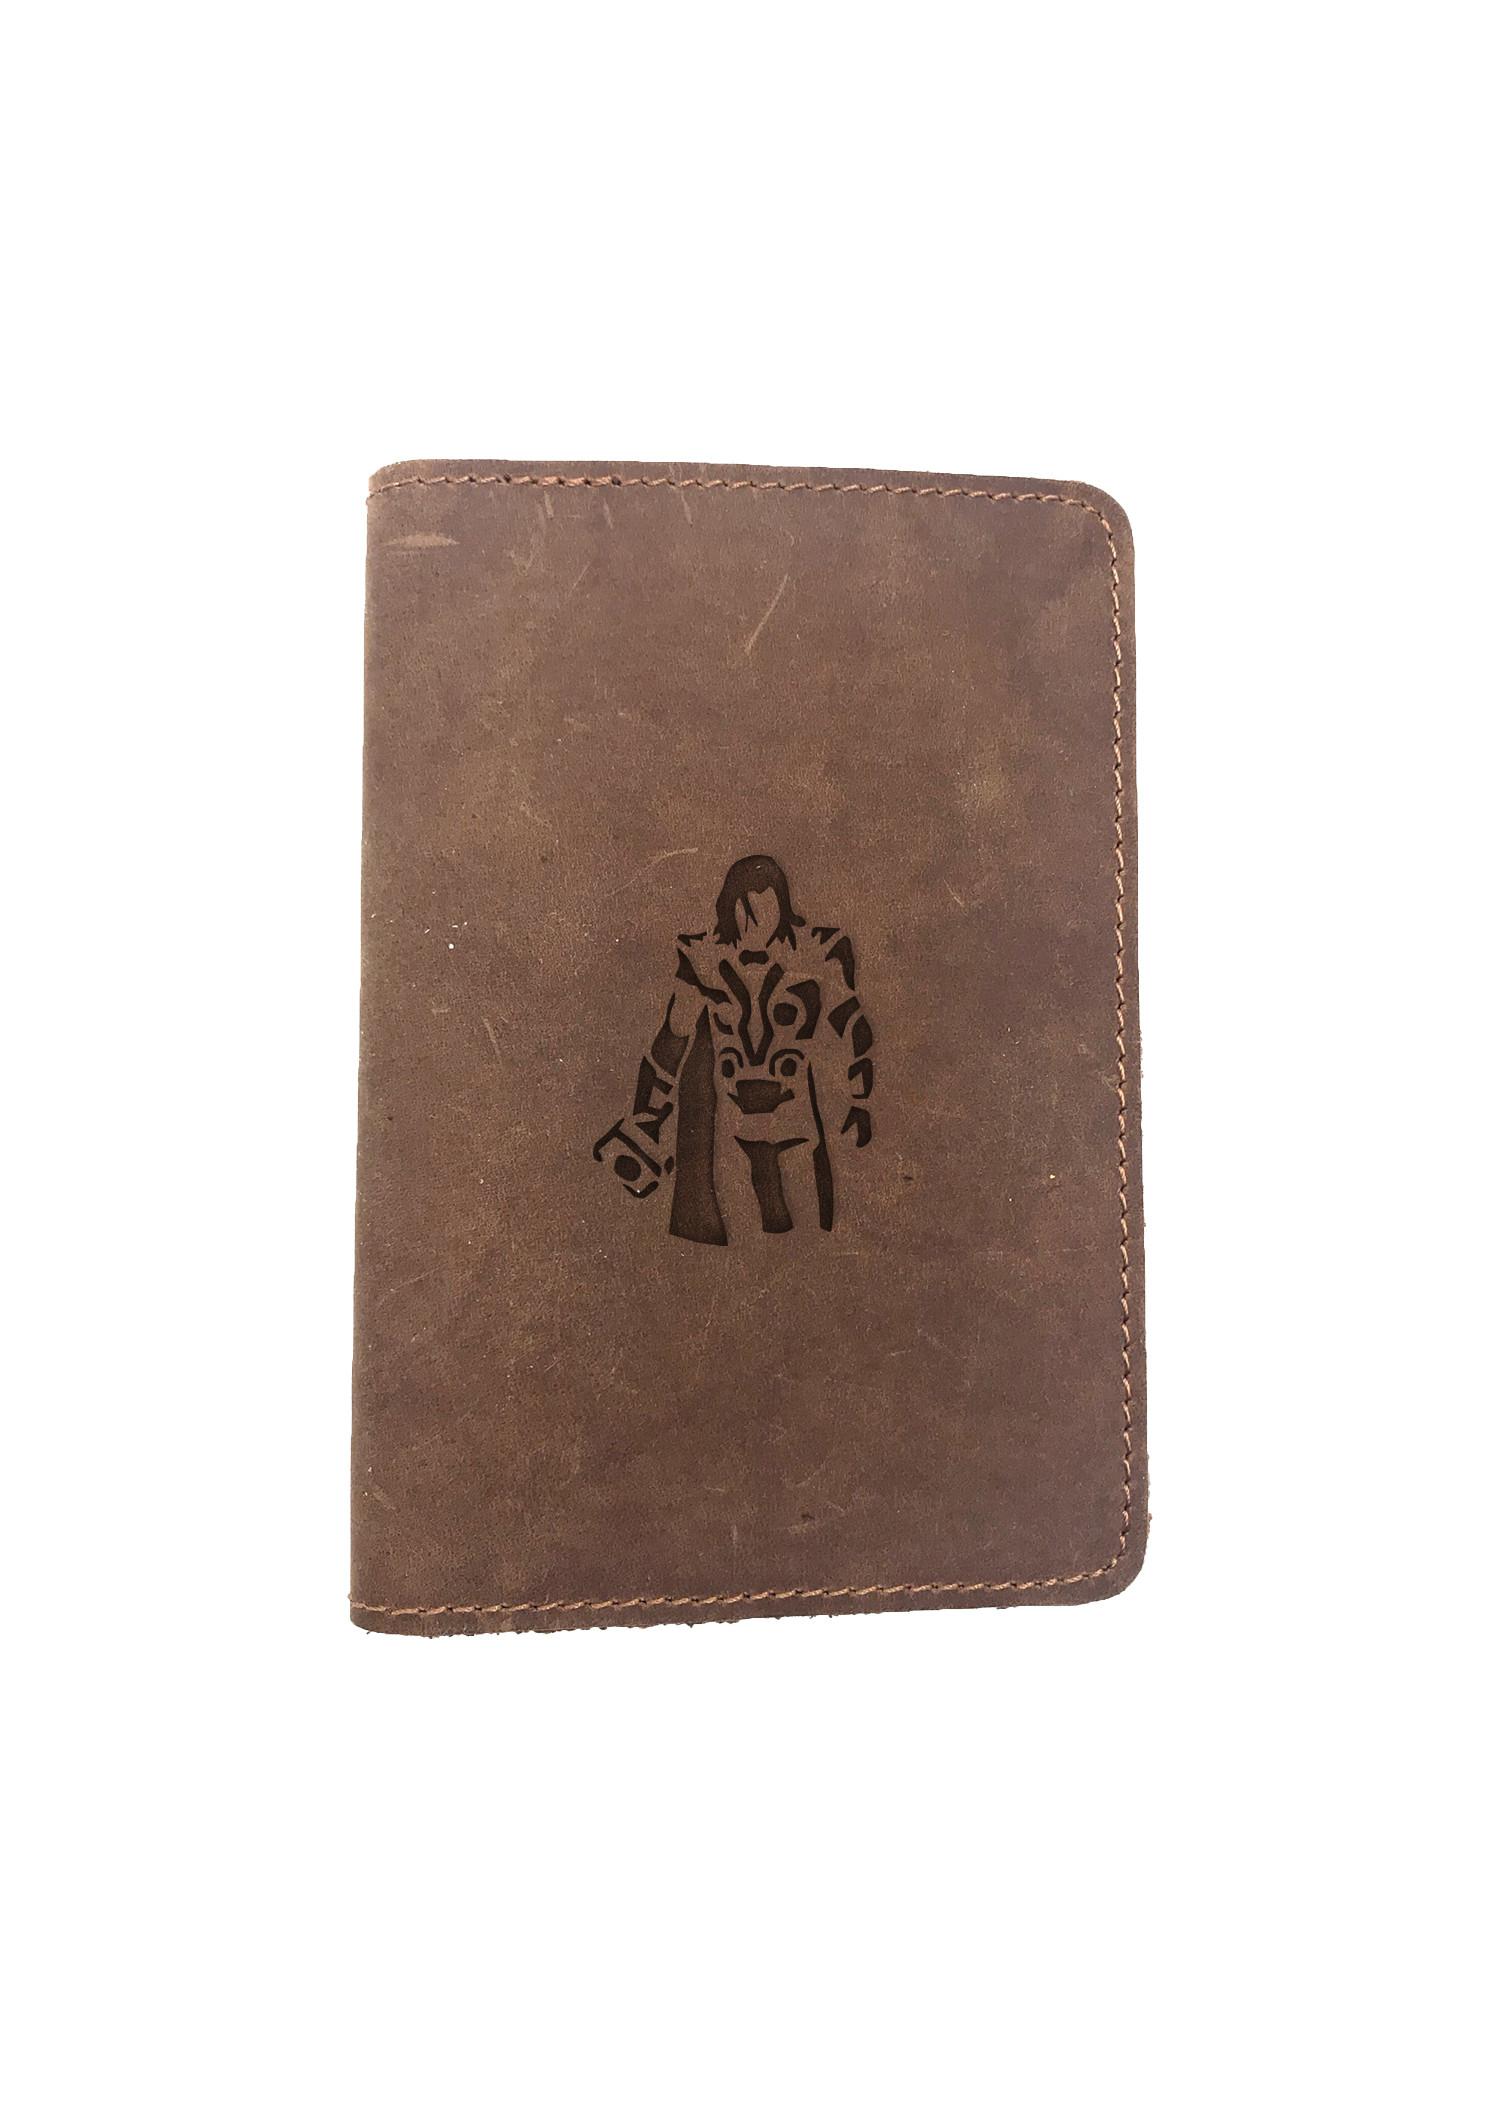 Passport Cover Bao Da Hộ Chiếu Da Sáp Khắc Hình Hình THOR ILLUSTRATRION (BROWN)